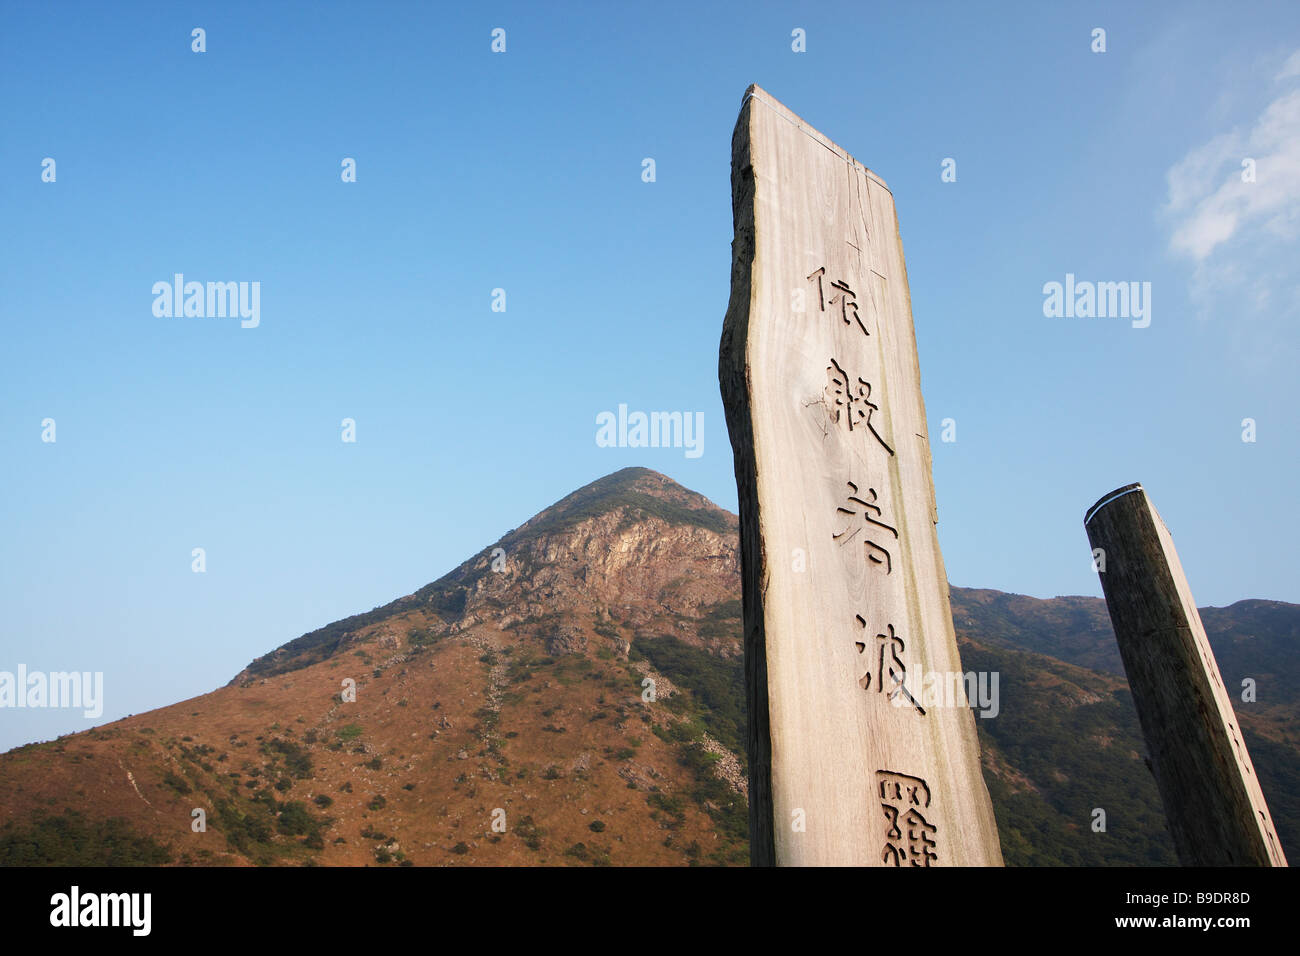 Wisdom Path, Lantau, Hong Kong - Stock Image